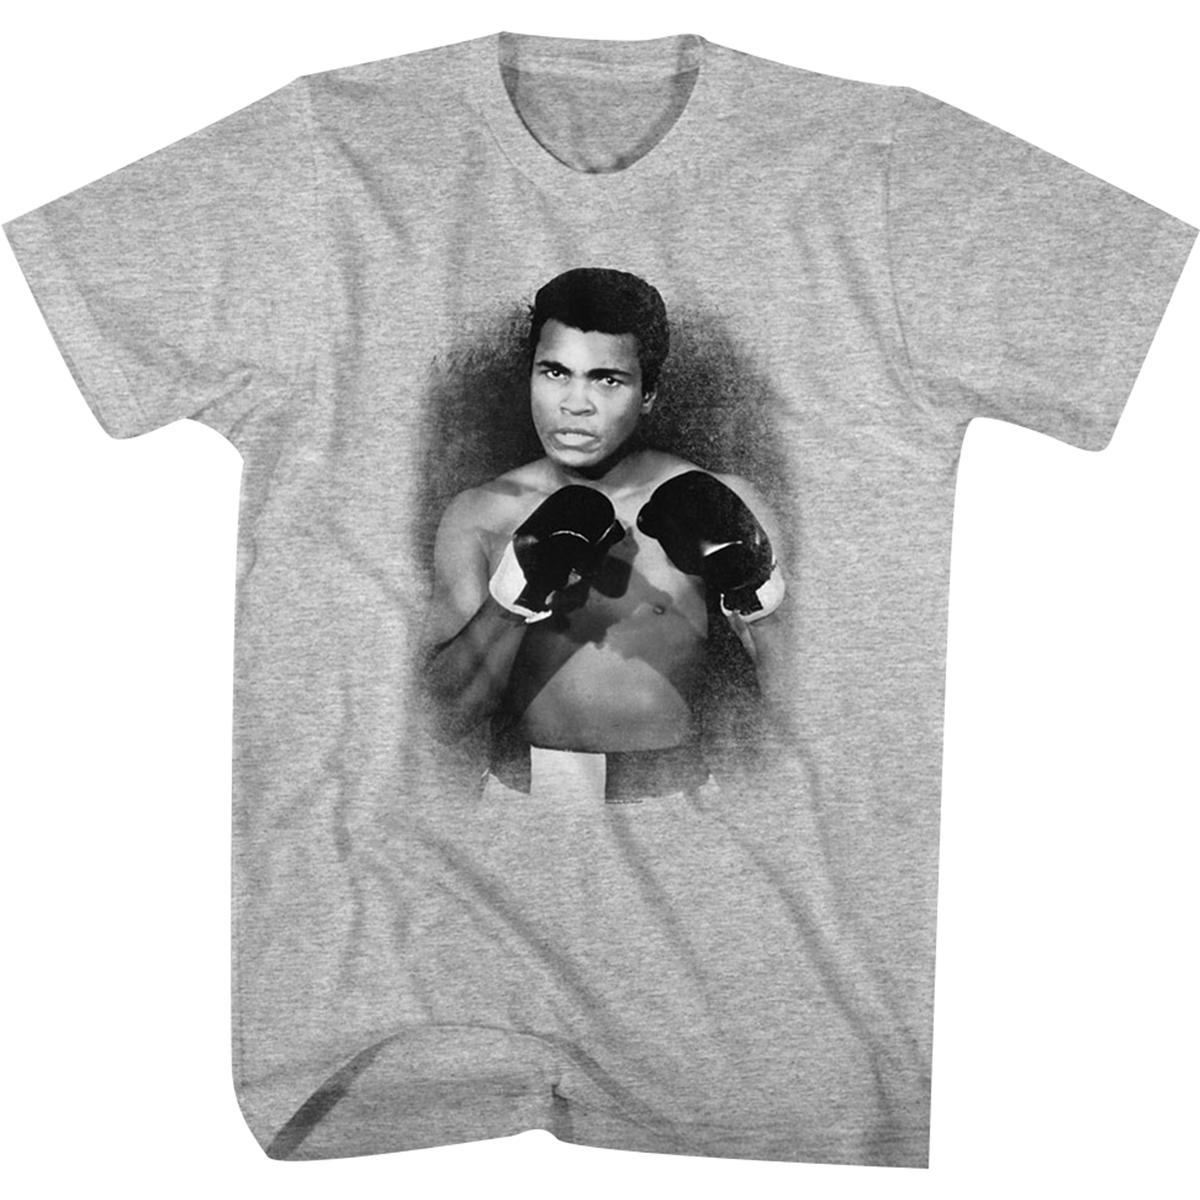 Graphite Heather American Classics Muhammad Ali The Greatest T-Shirt